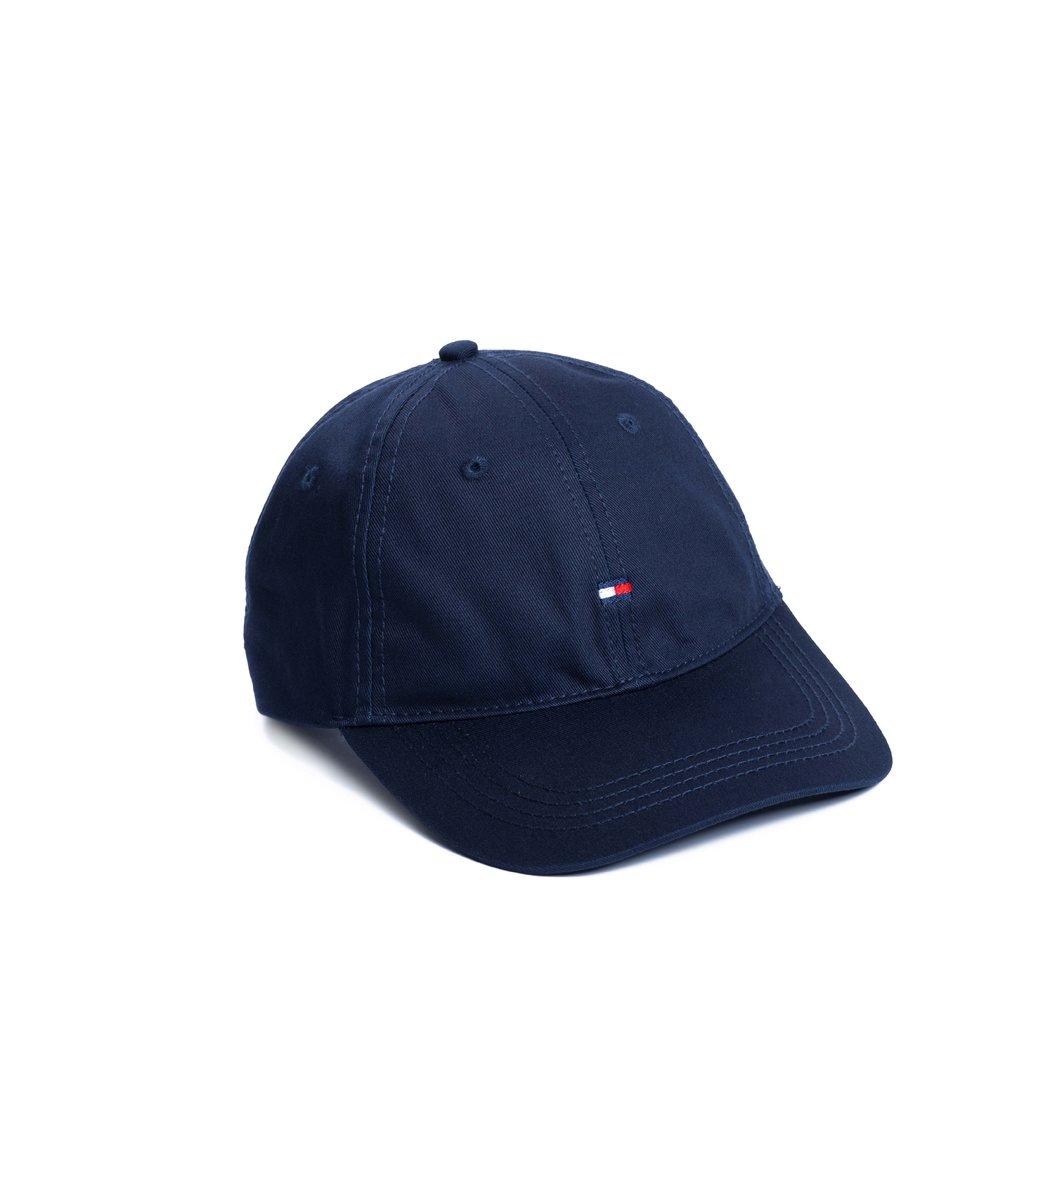 Кепка Tommy Hilfiger Small logo синий